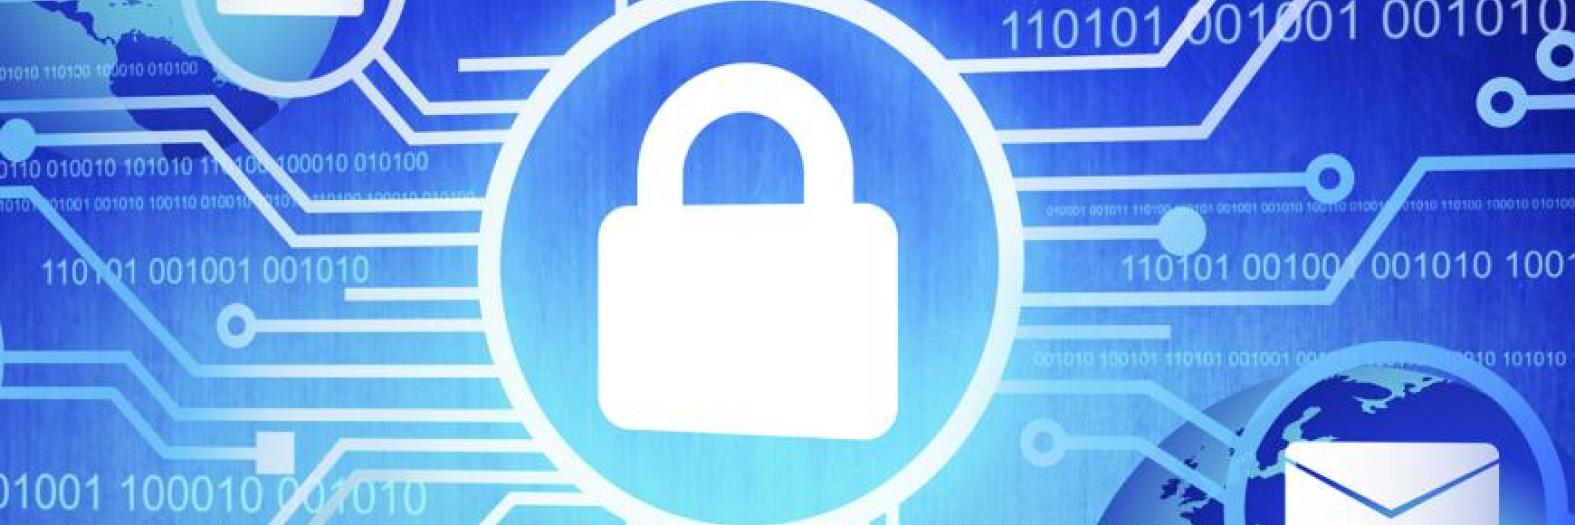 cybersecurity2024.jpg